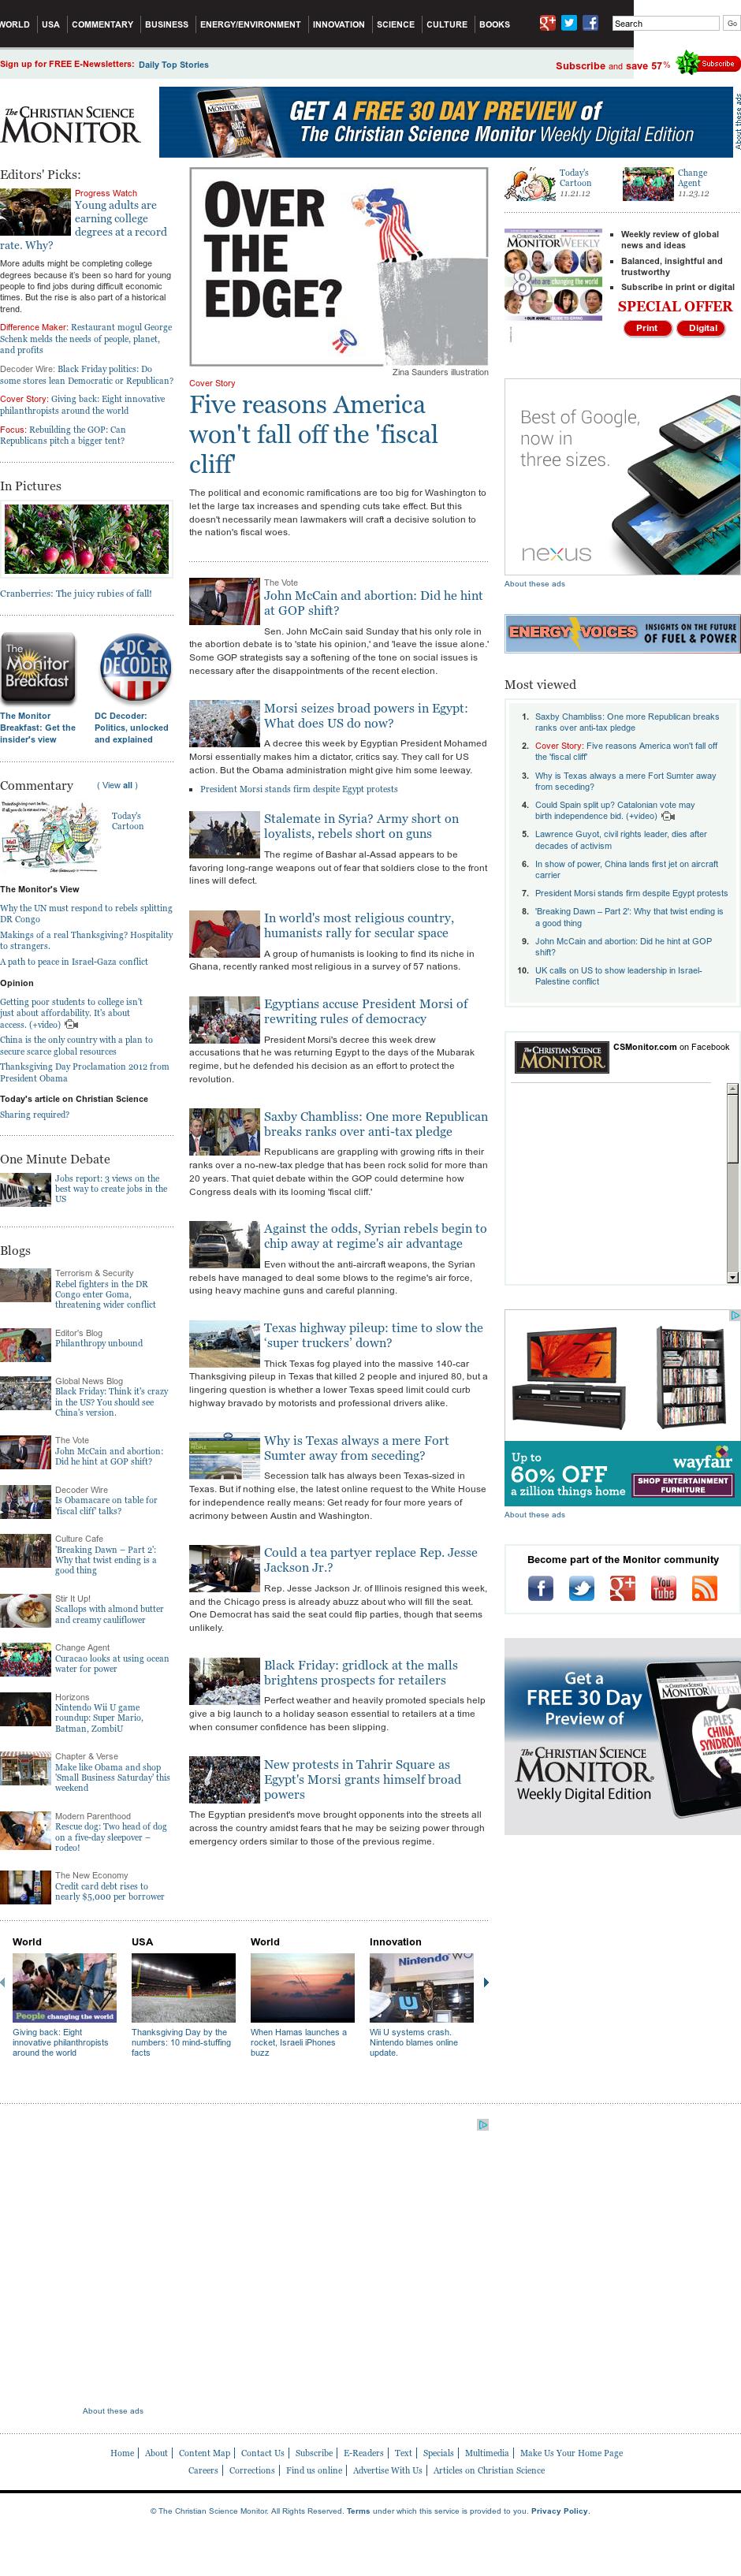 The Christian Science Monitor at Monday Nov. 26, 2012, 5:04 a.m. UTC